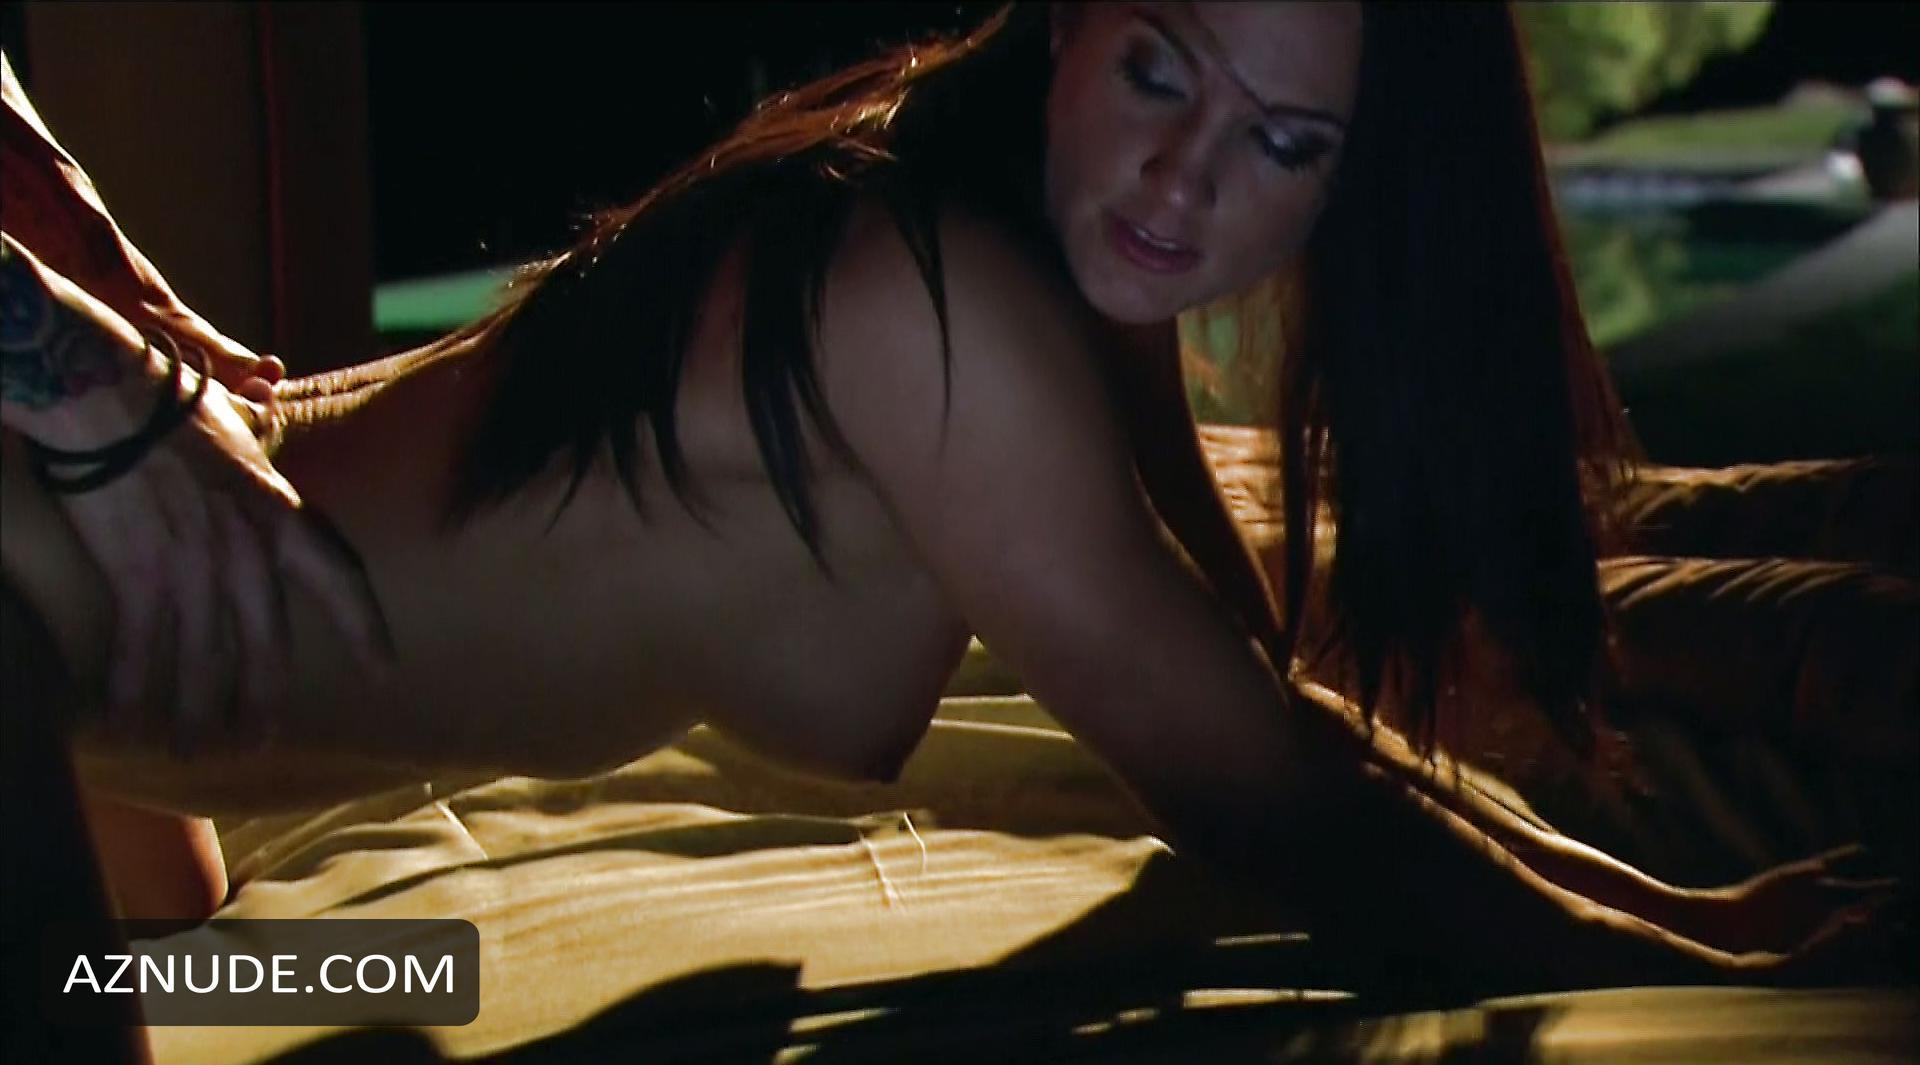 birthday sex movie misty anderson nude